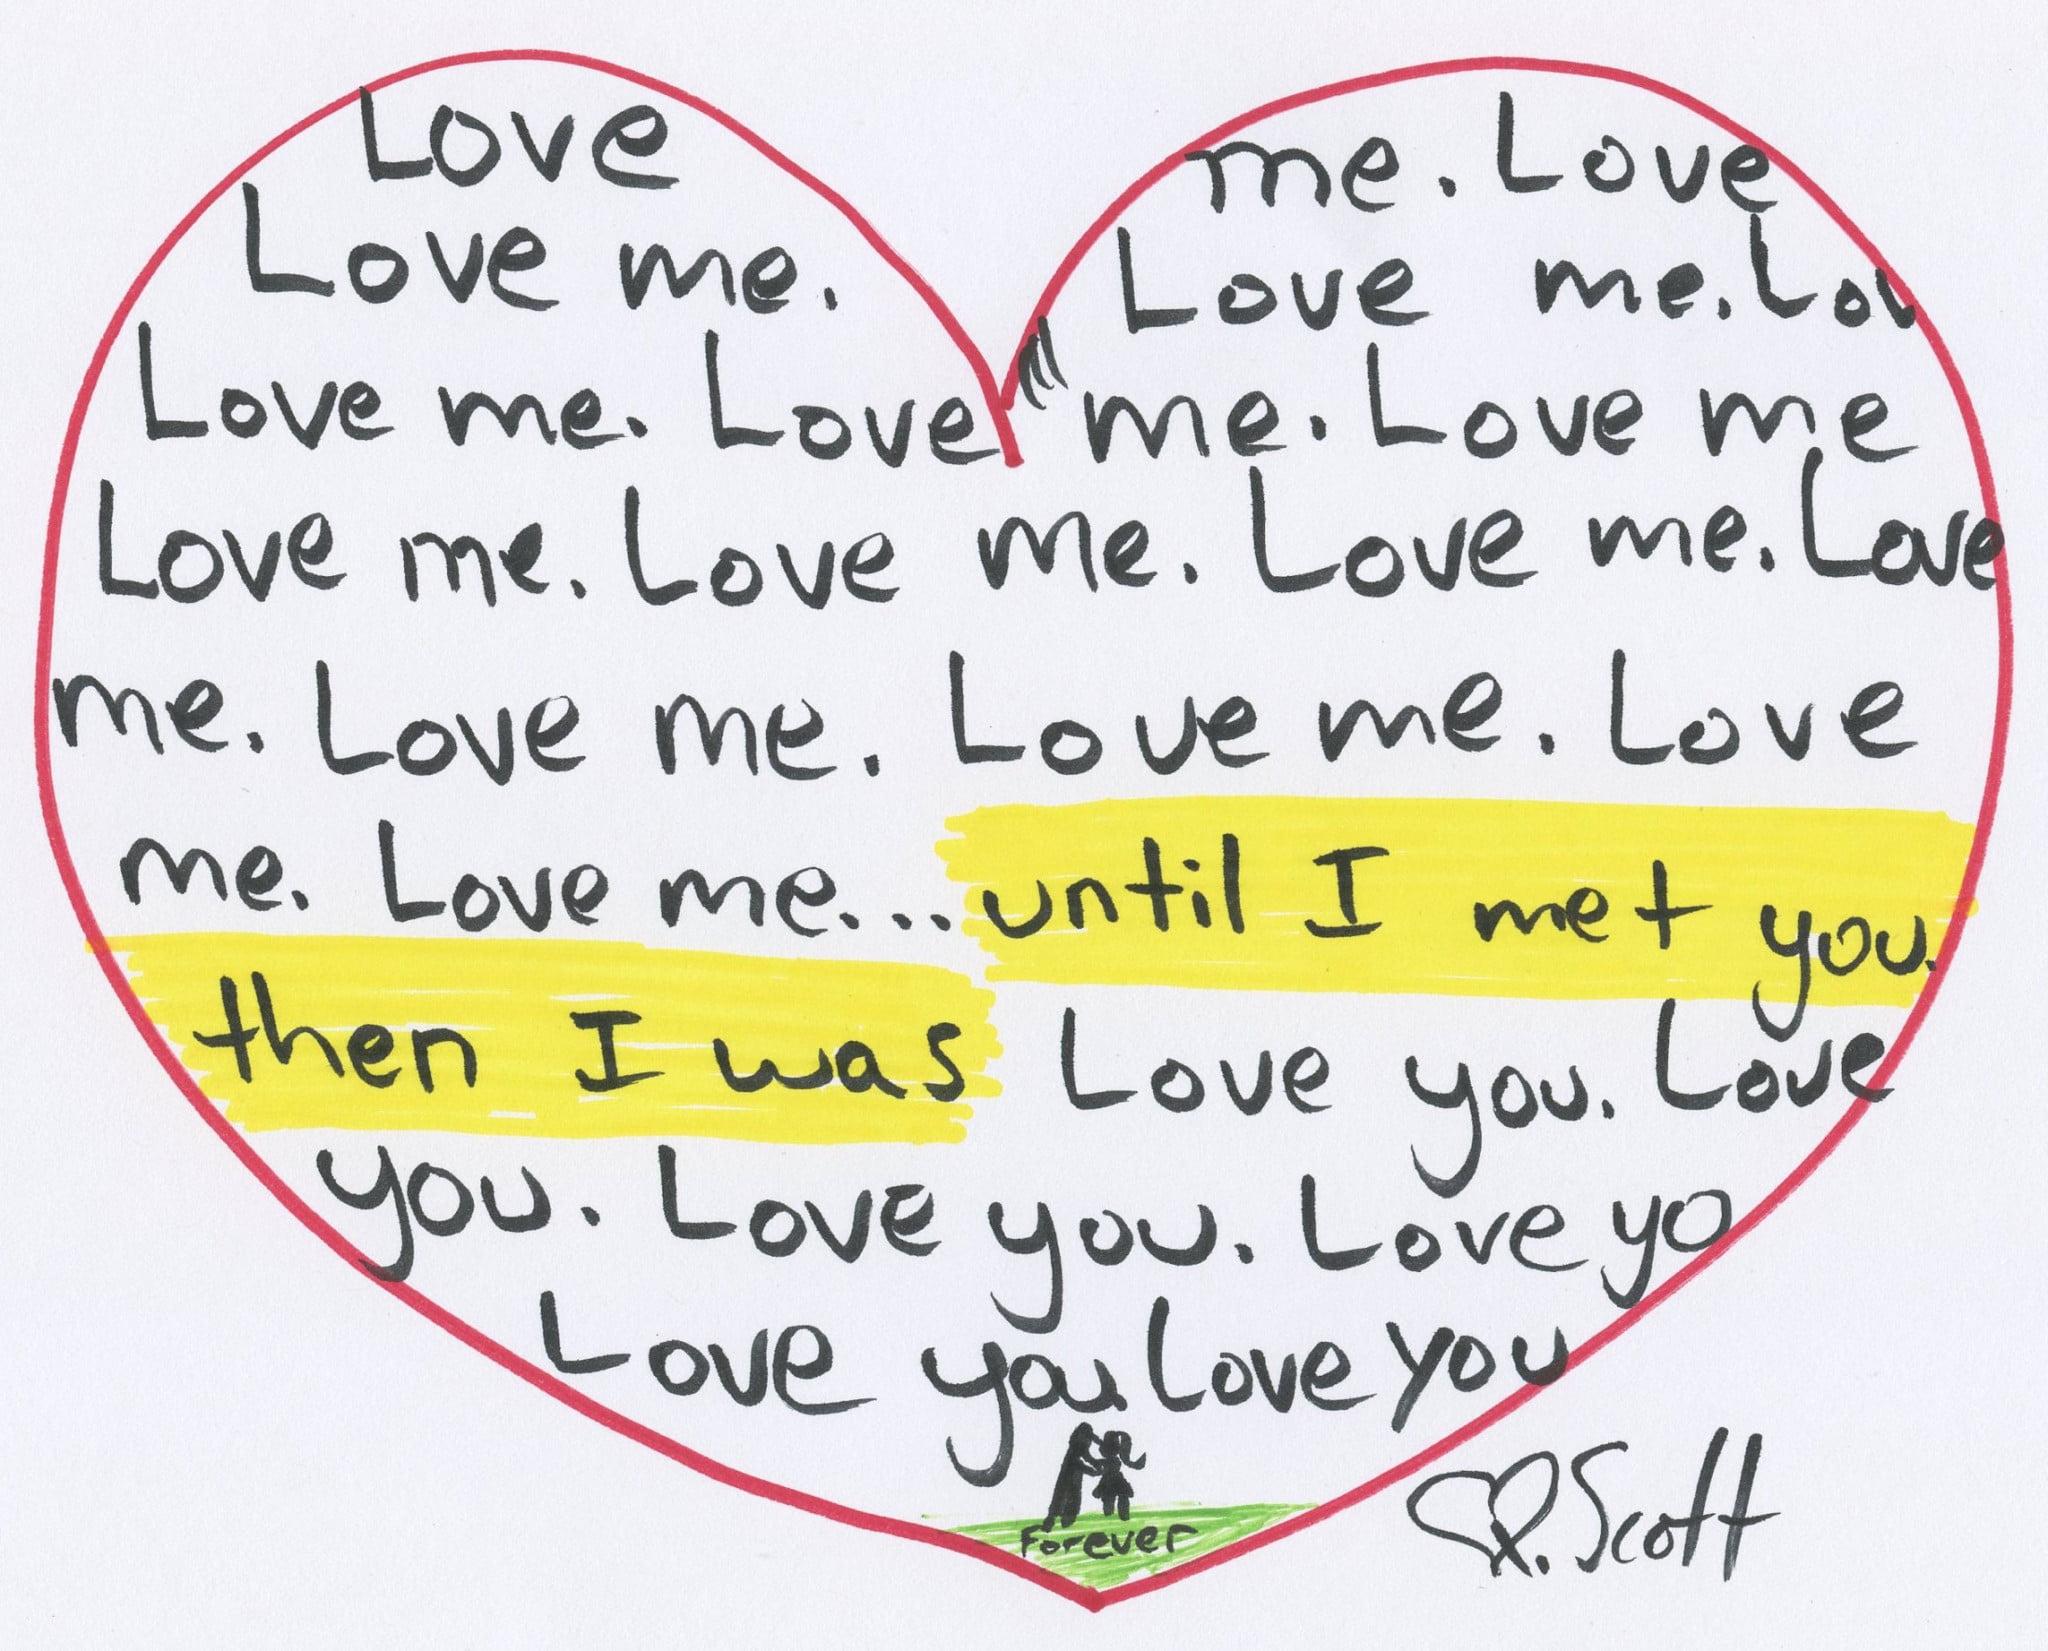 Love me. Love me. Love me... until I met you. Then I was Love you. Love you. Love you. Love you.